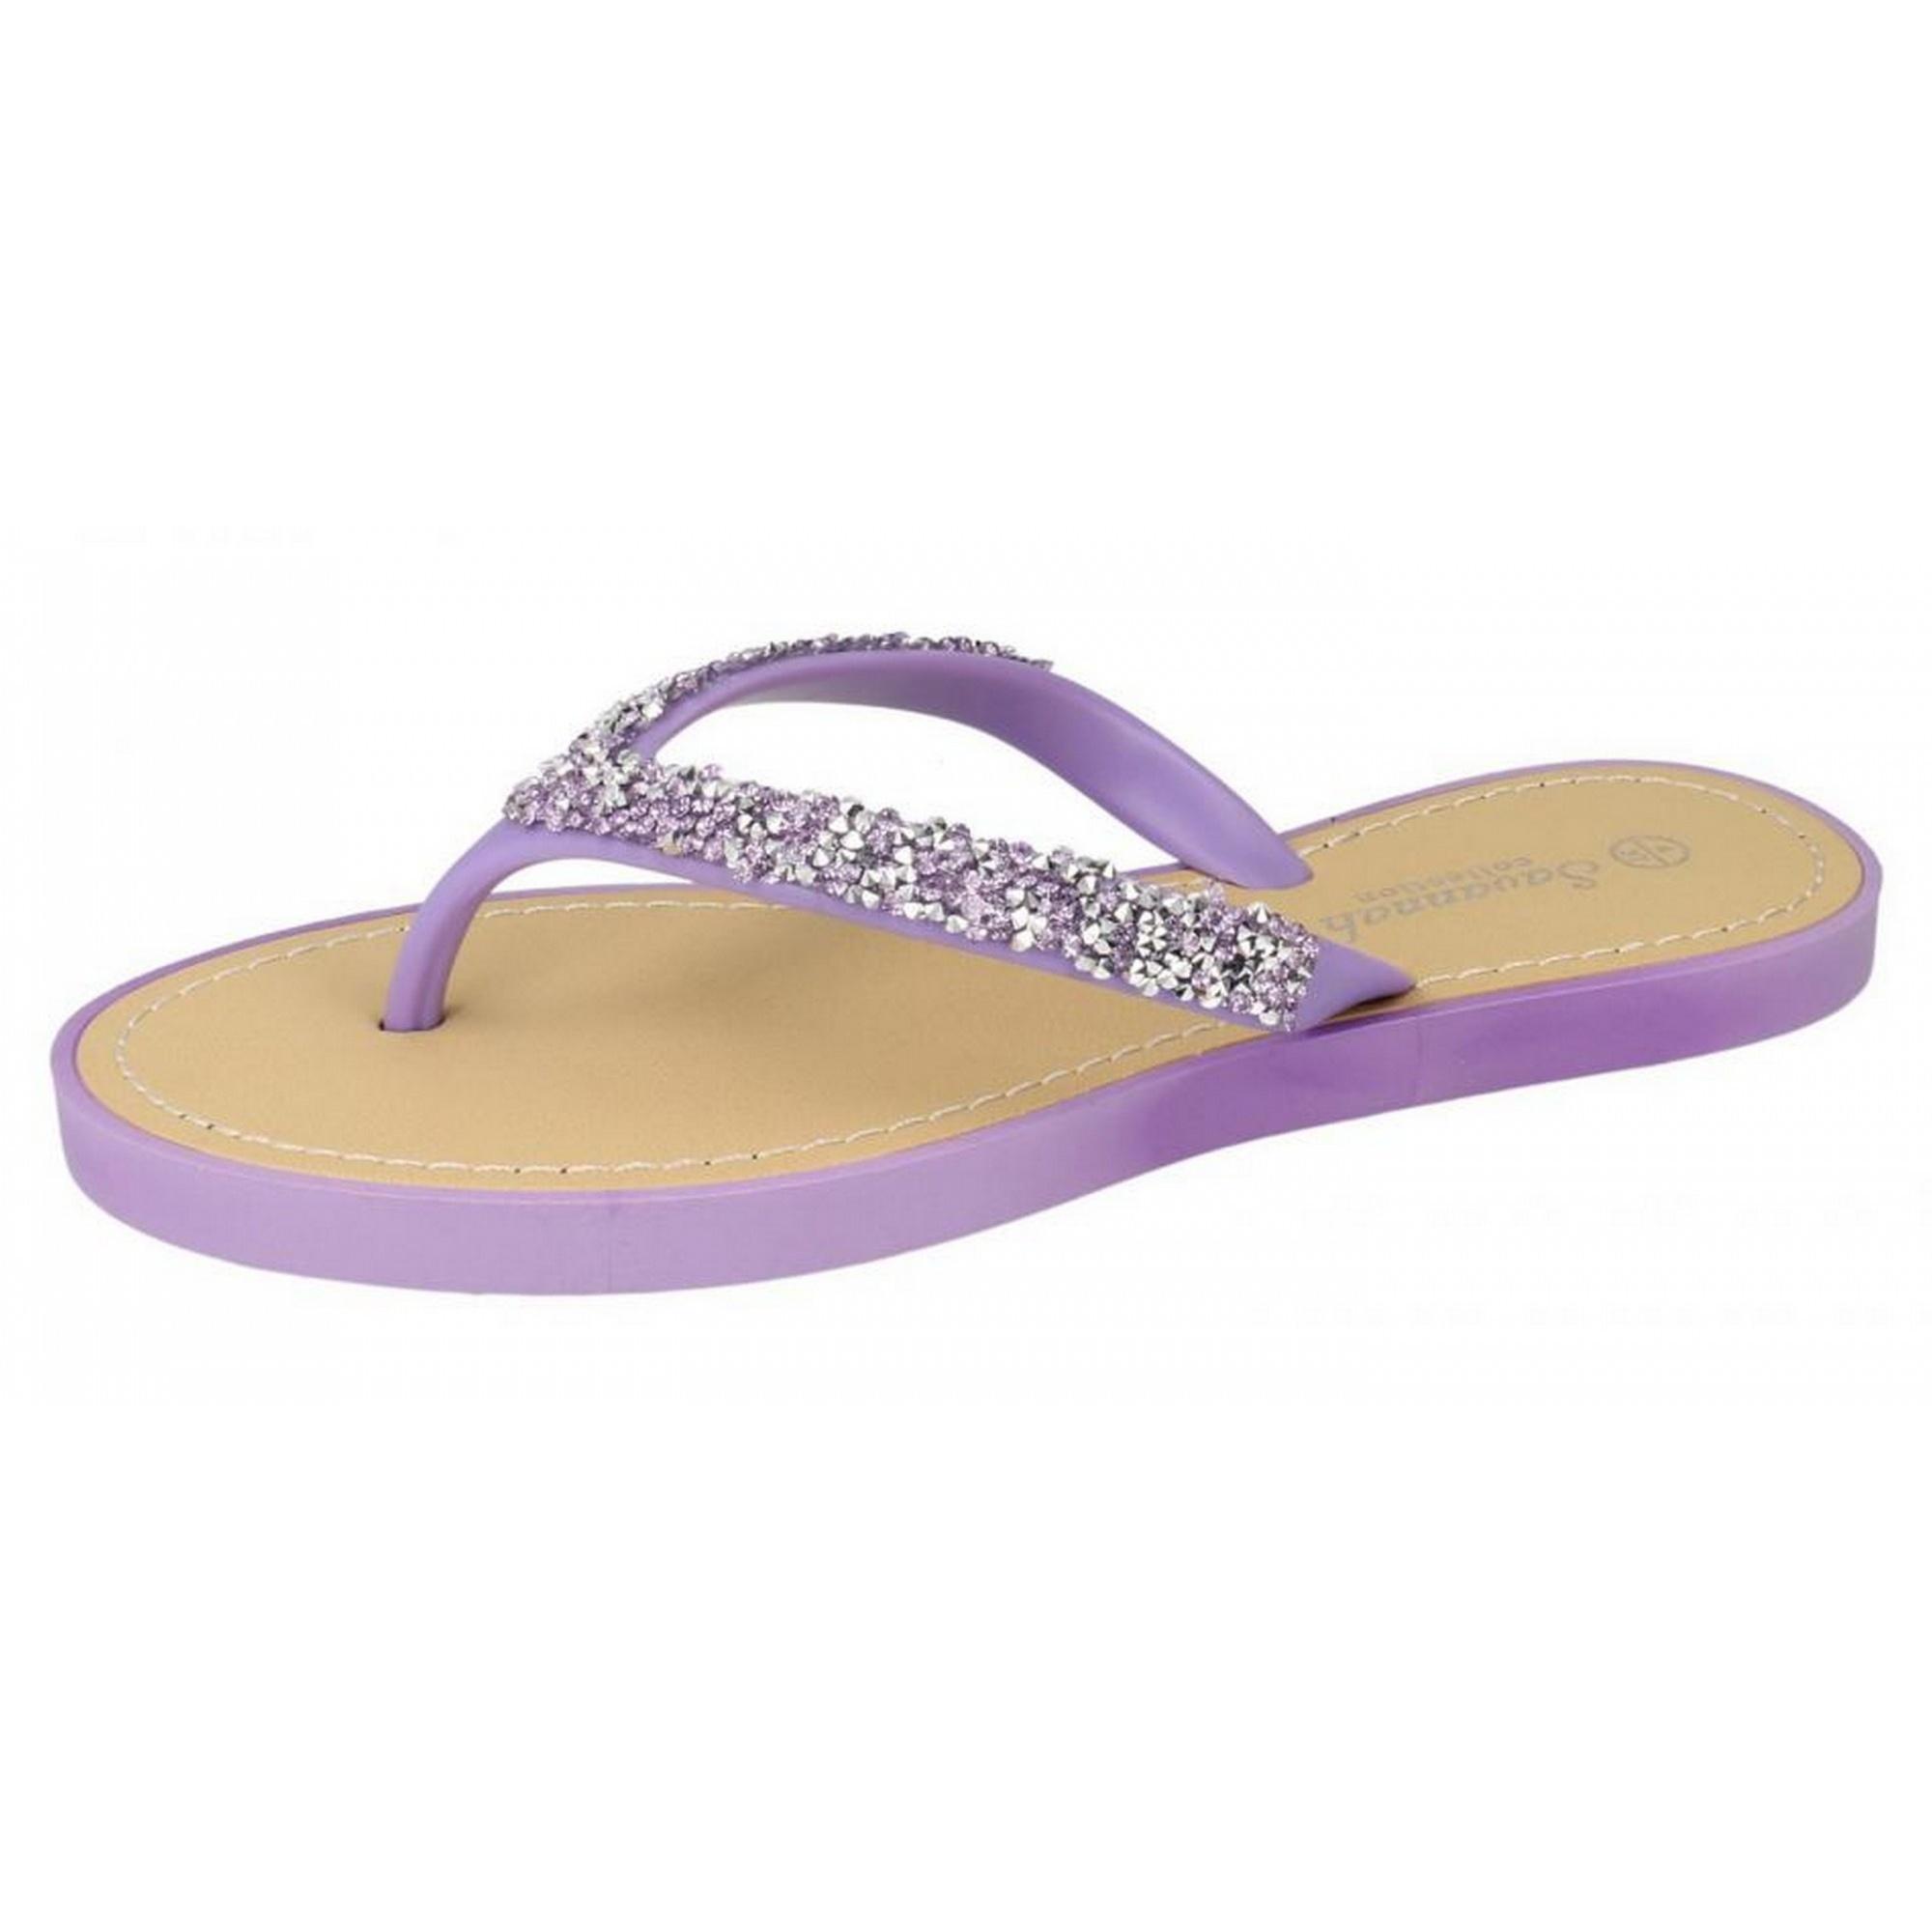 Savannah Damen Zehensteg-Sandalen / Flip Flops mit Glitzer-Design (37 EU) (Pink) FteyGmc9c